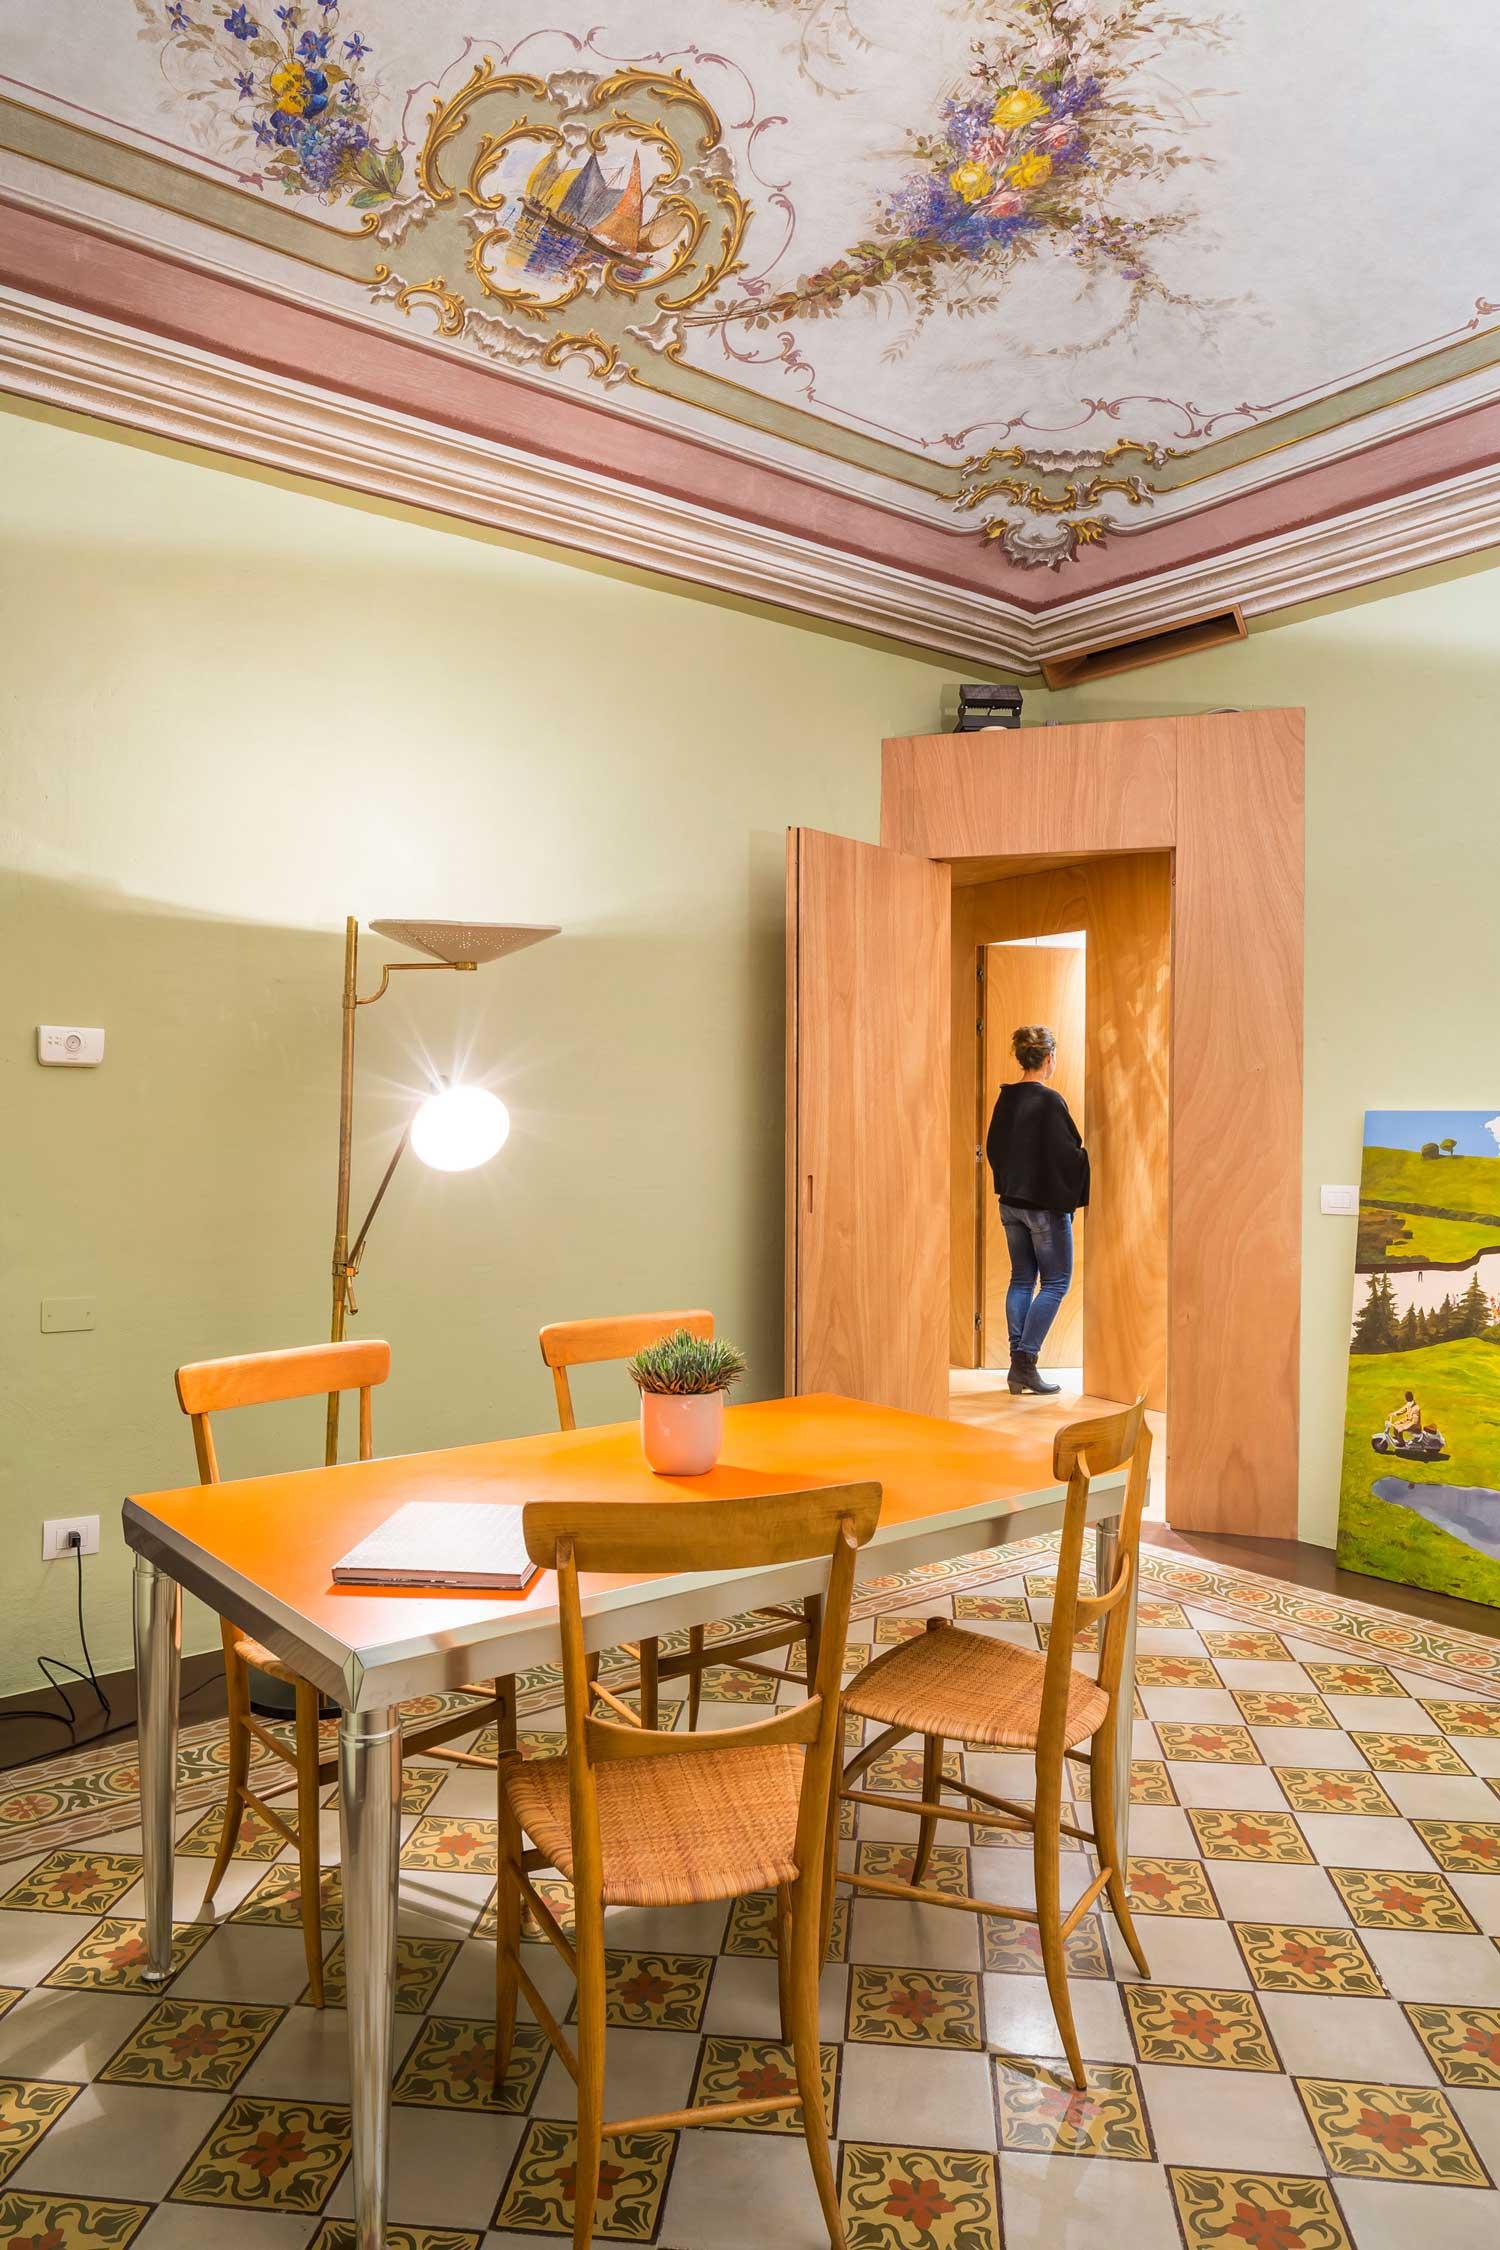 Apartment Renovation In Manhattan: Heritage Apartment Renovation In Chiavari By Nicola